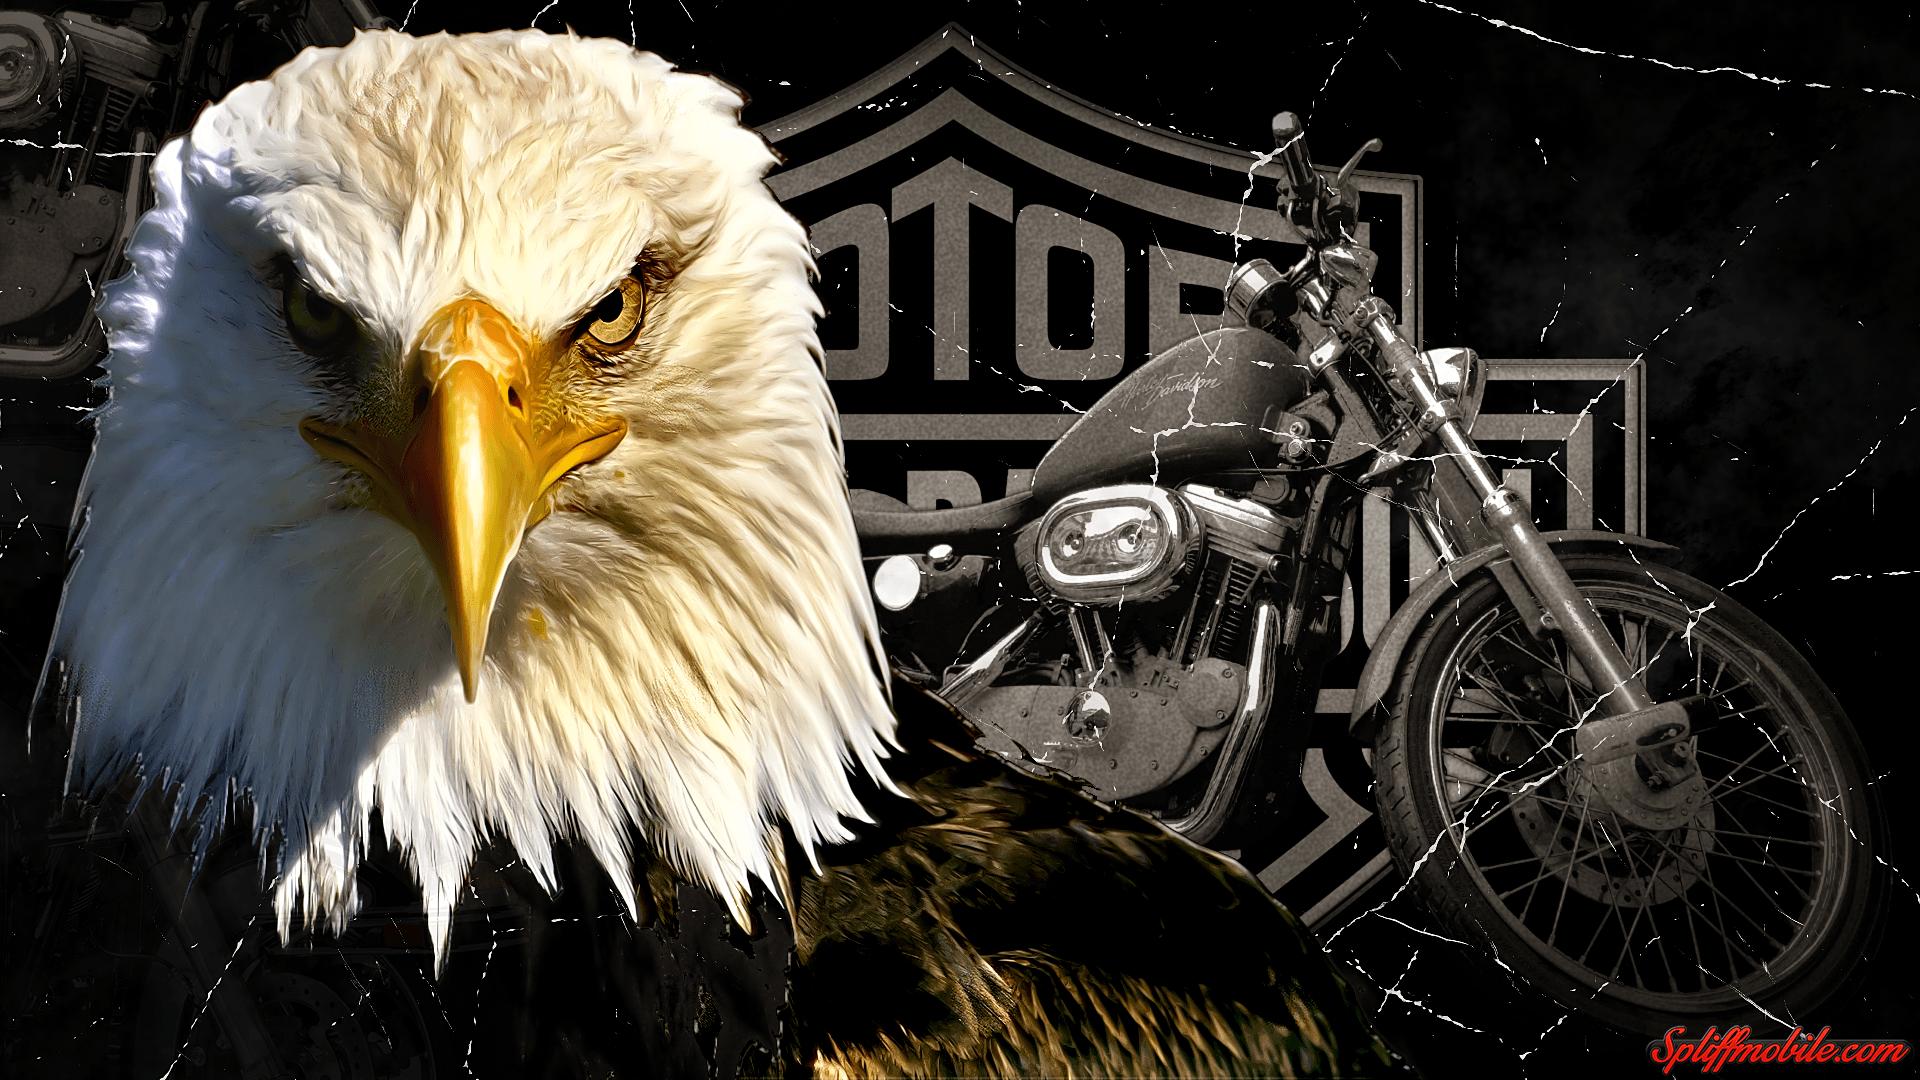 Harley Davidson Eagle Wallpapers Top Free Harley Davidson